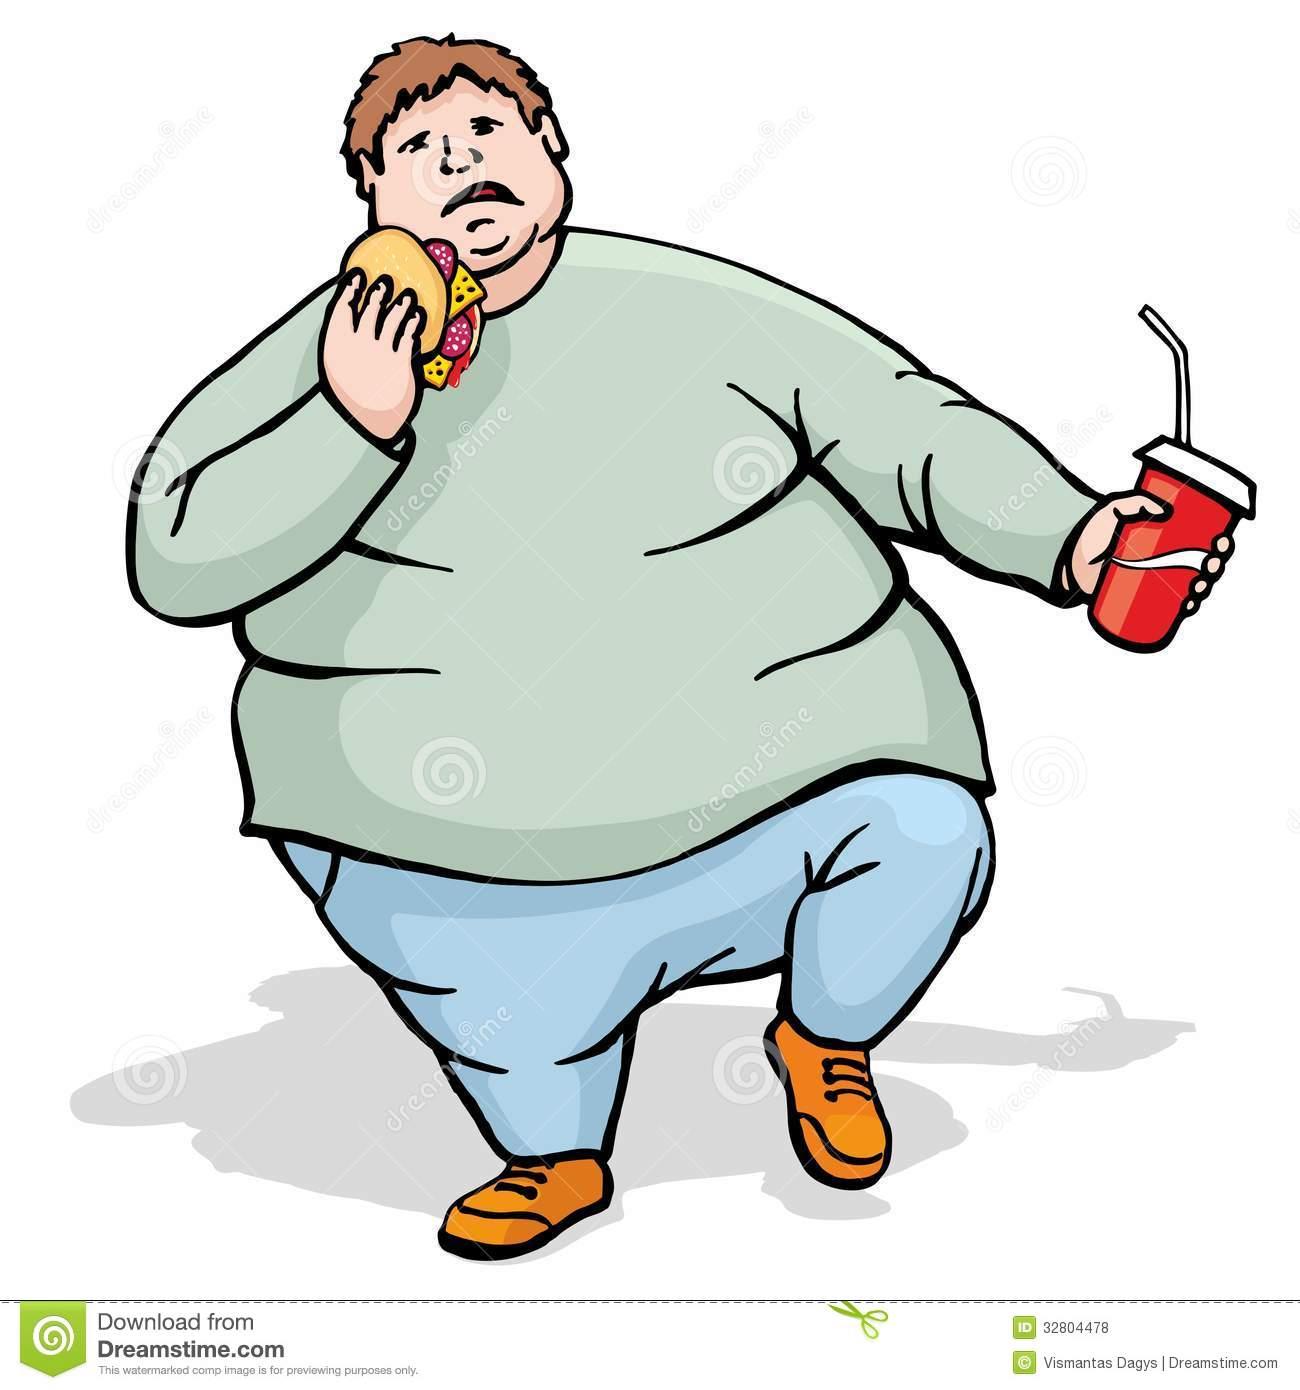 man clipartlook. Fat clipart fat person